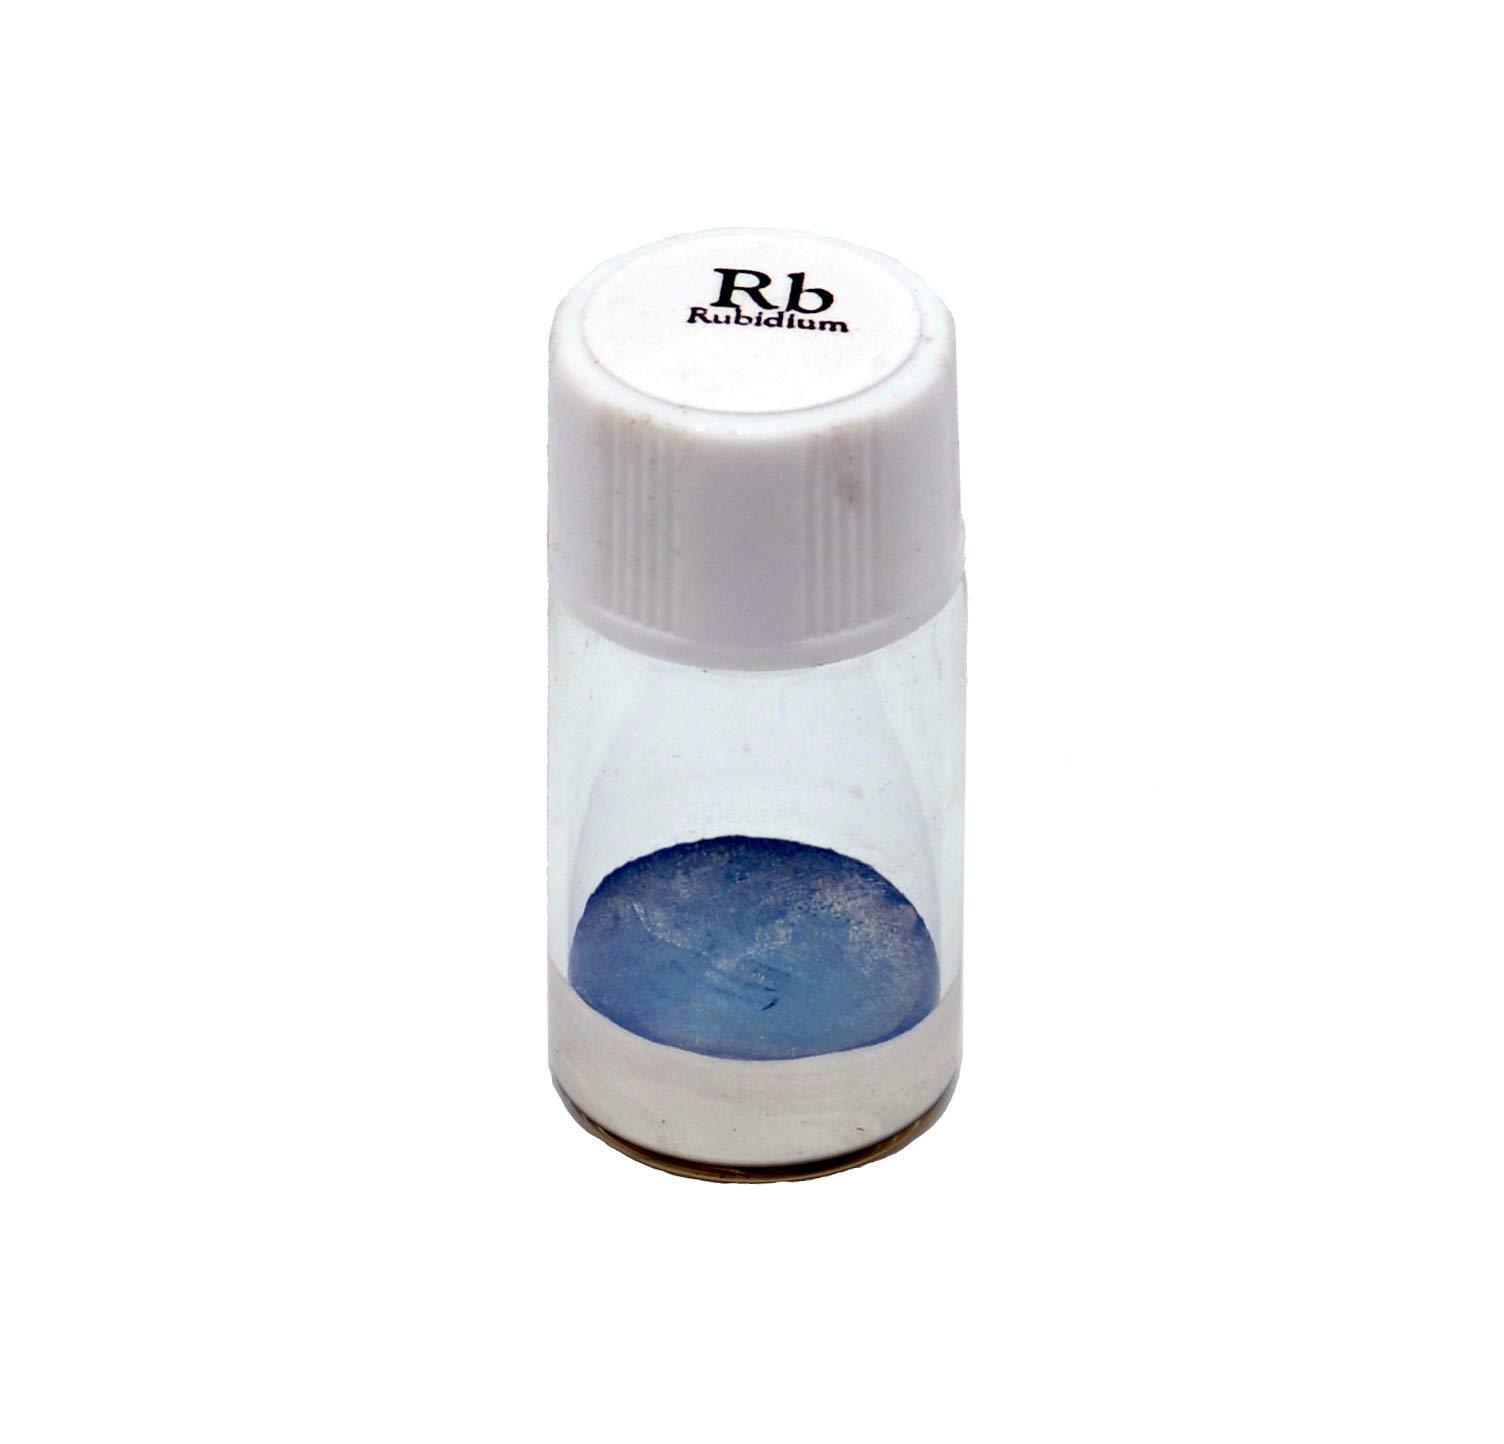 Rubidium Metal 99.95% Pure 1 Gram for Element Collection